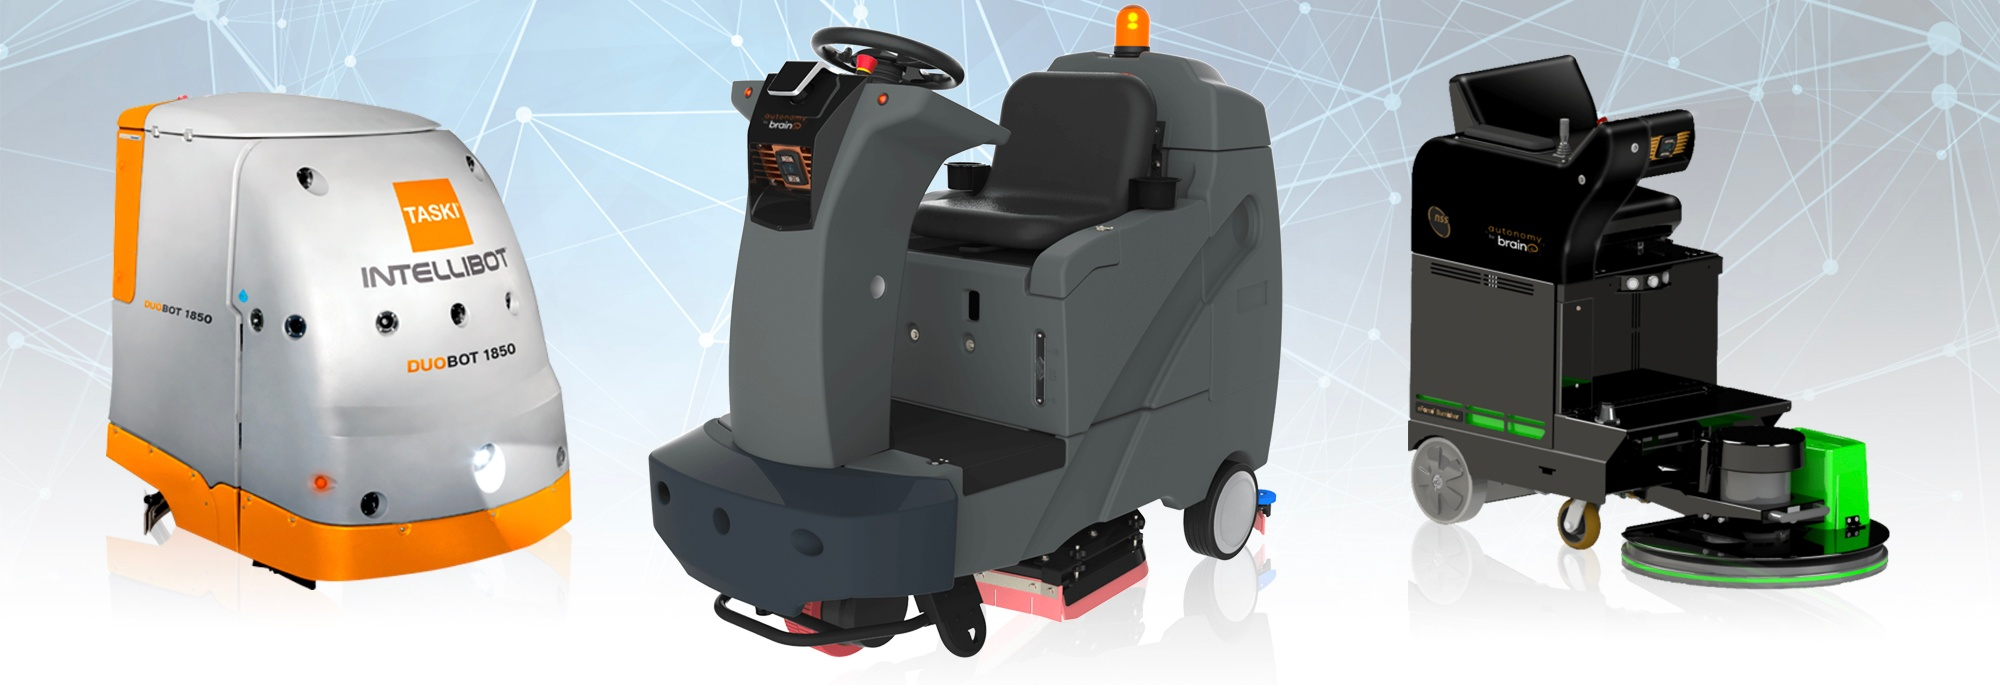 robotic-cleaning-2.jpg